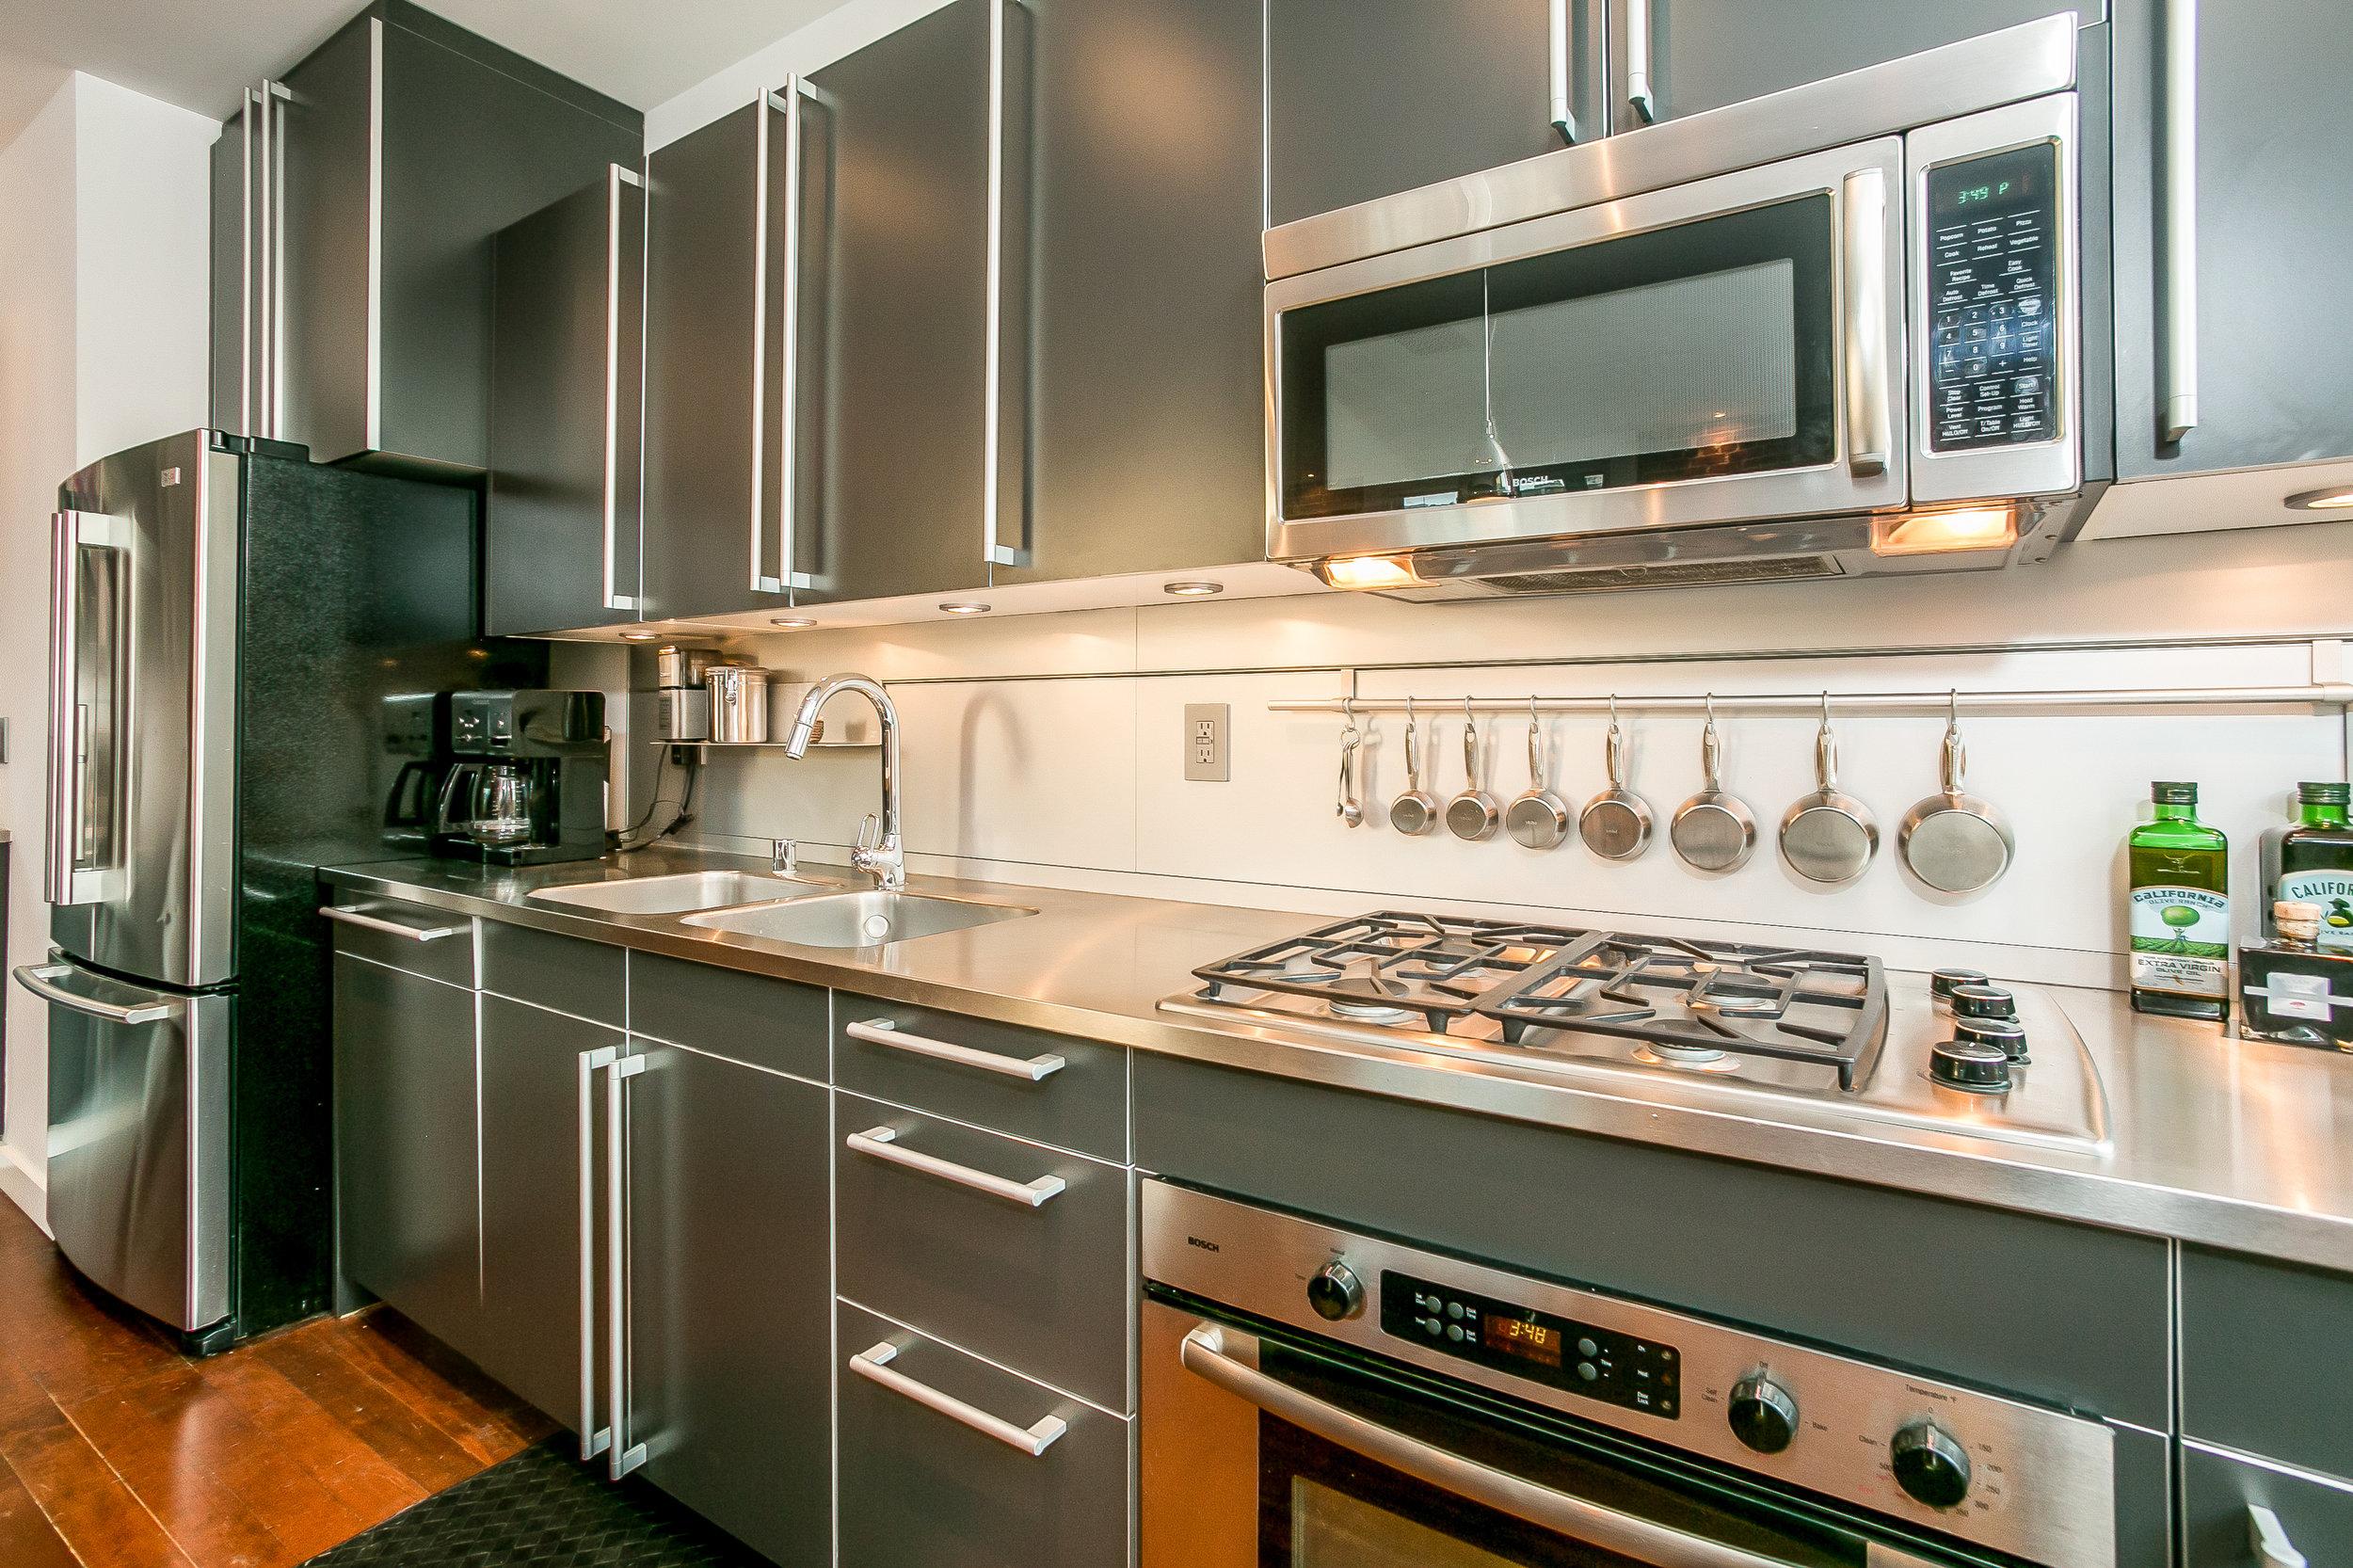 020-Kitchen-3508510-large.jpg